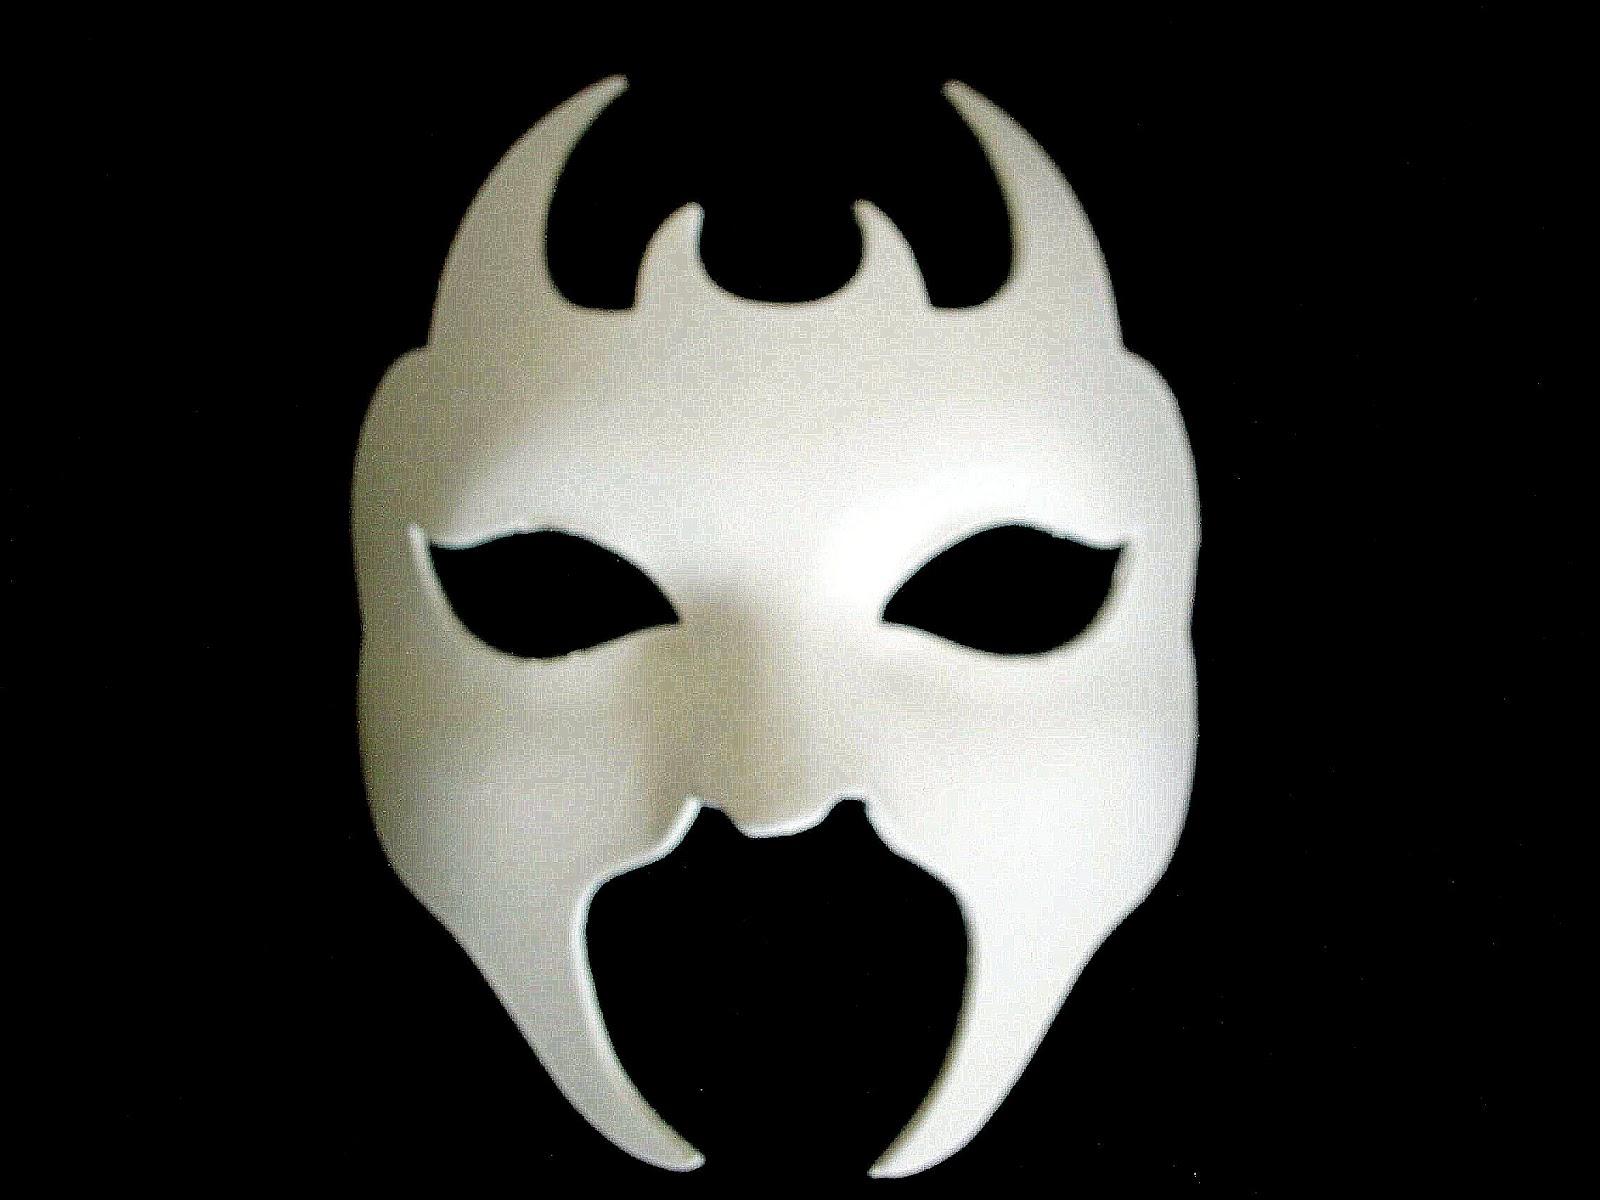 Masquerade Mask Template Free – Masquerade Mask Template